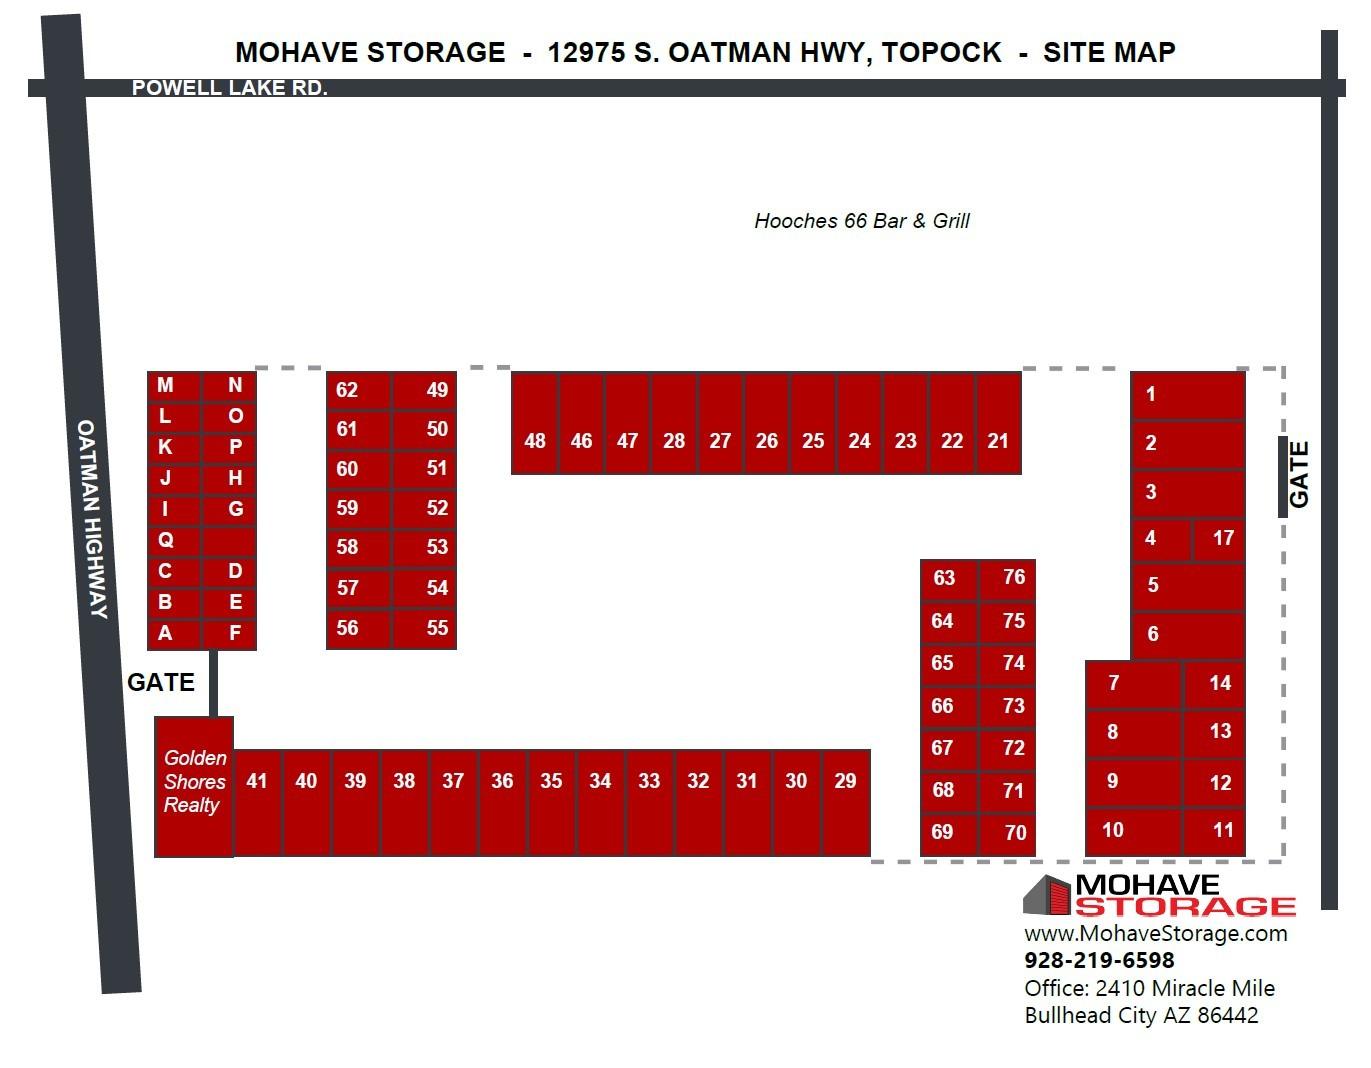 Site map S Oatman Hwy Golden Shores Topock Site Map Prospective Tenants Mohave Storage